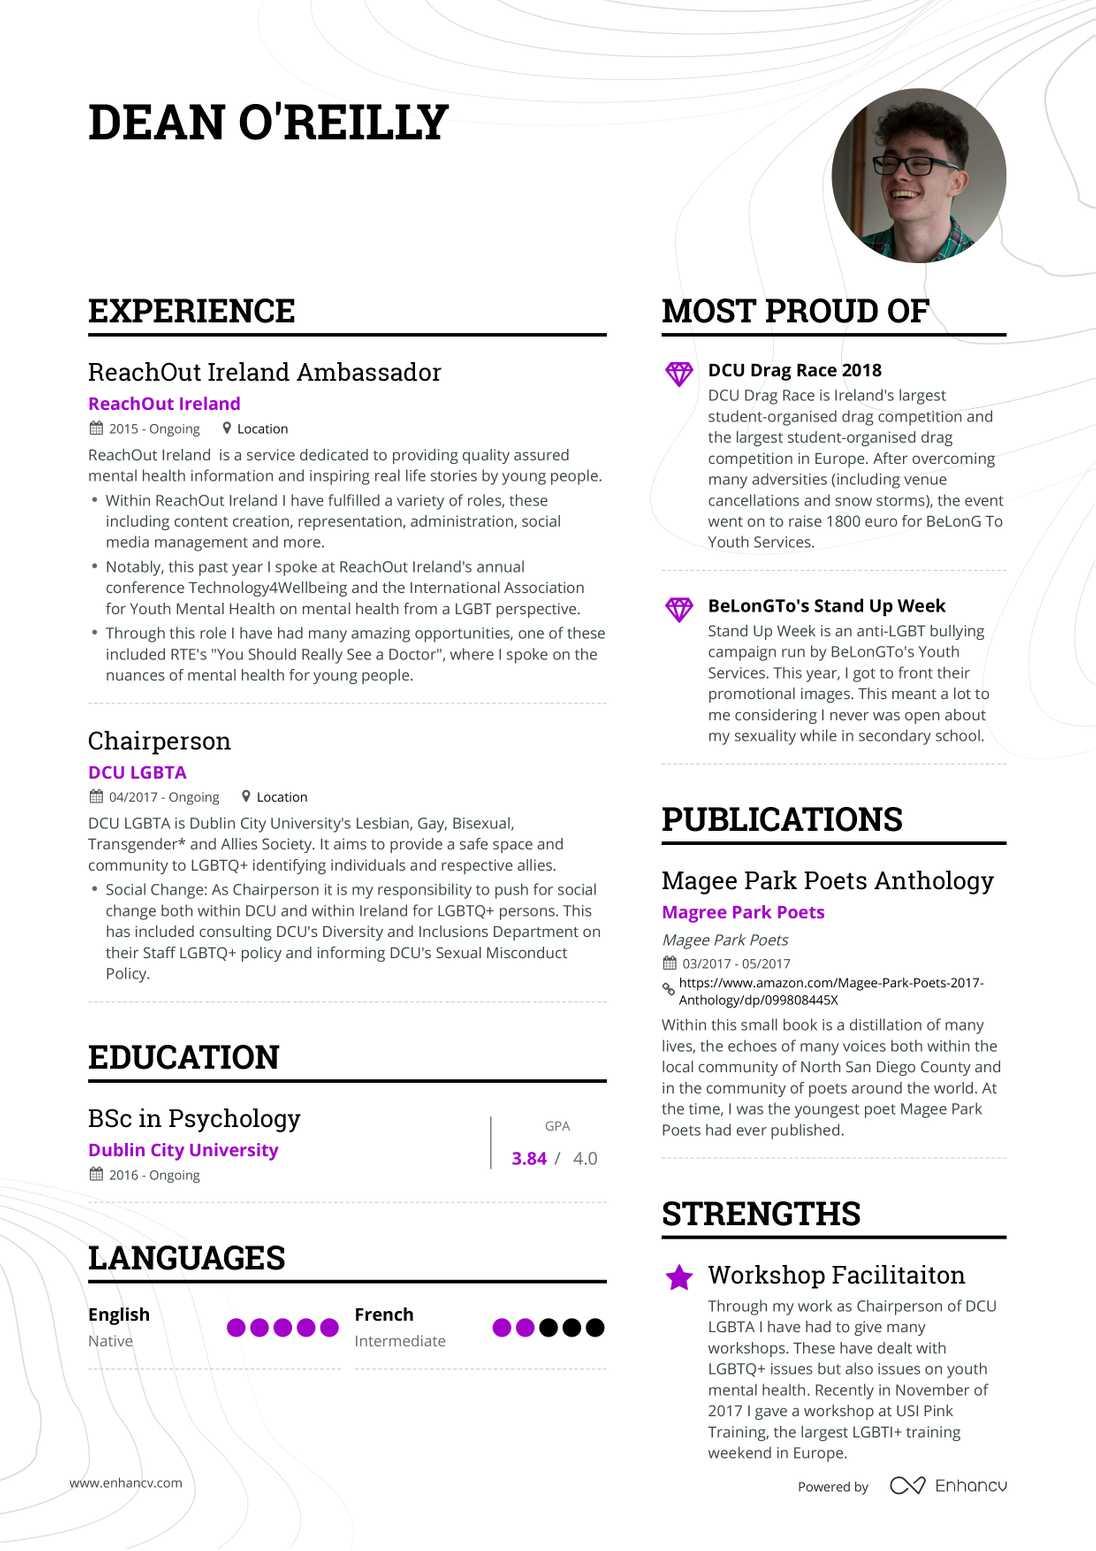 Real Student Resume Example | Enhancv